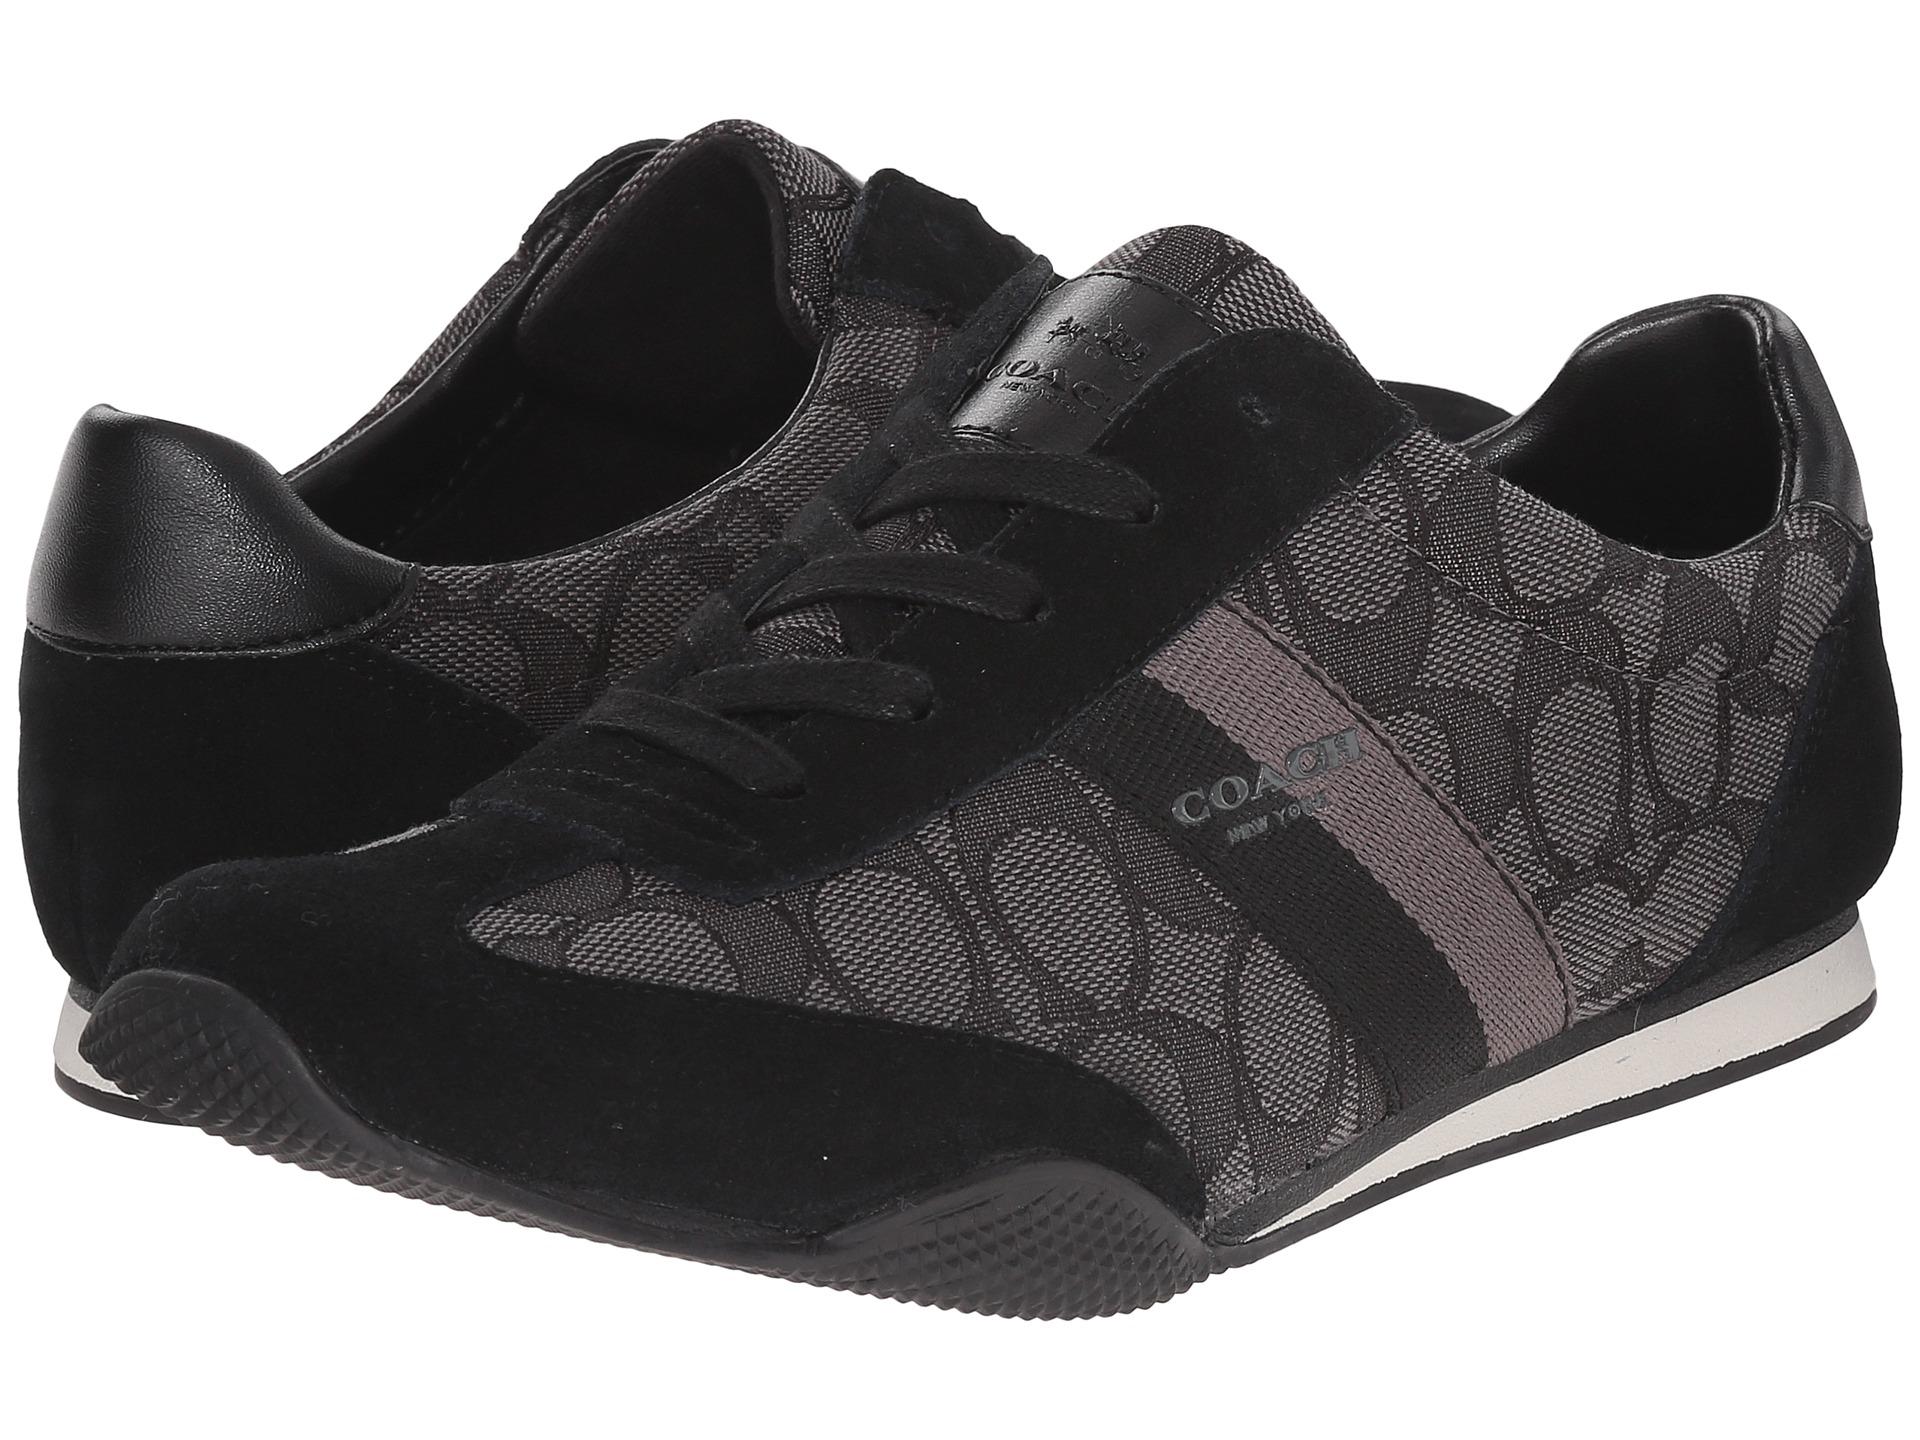 coach tennis shoes black ,coach purse pink